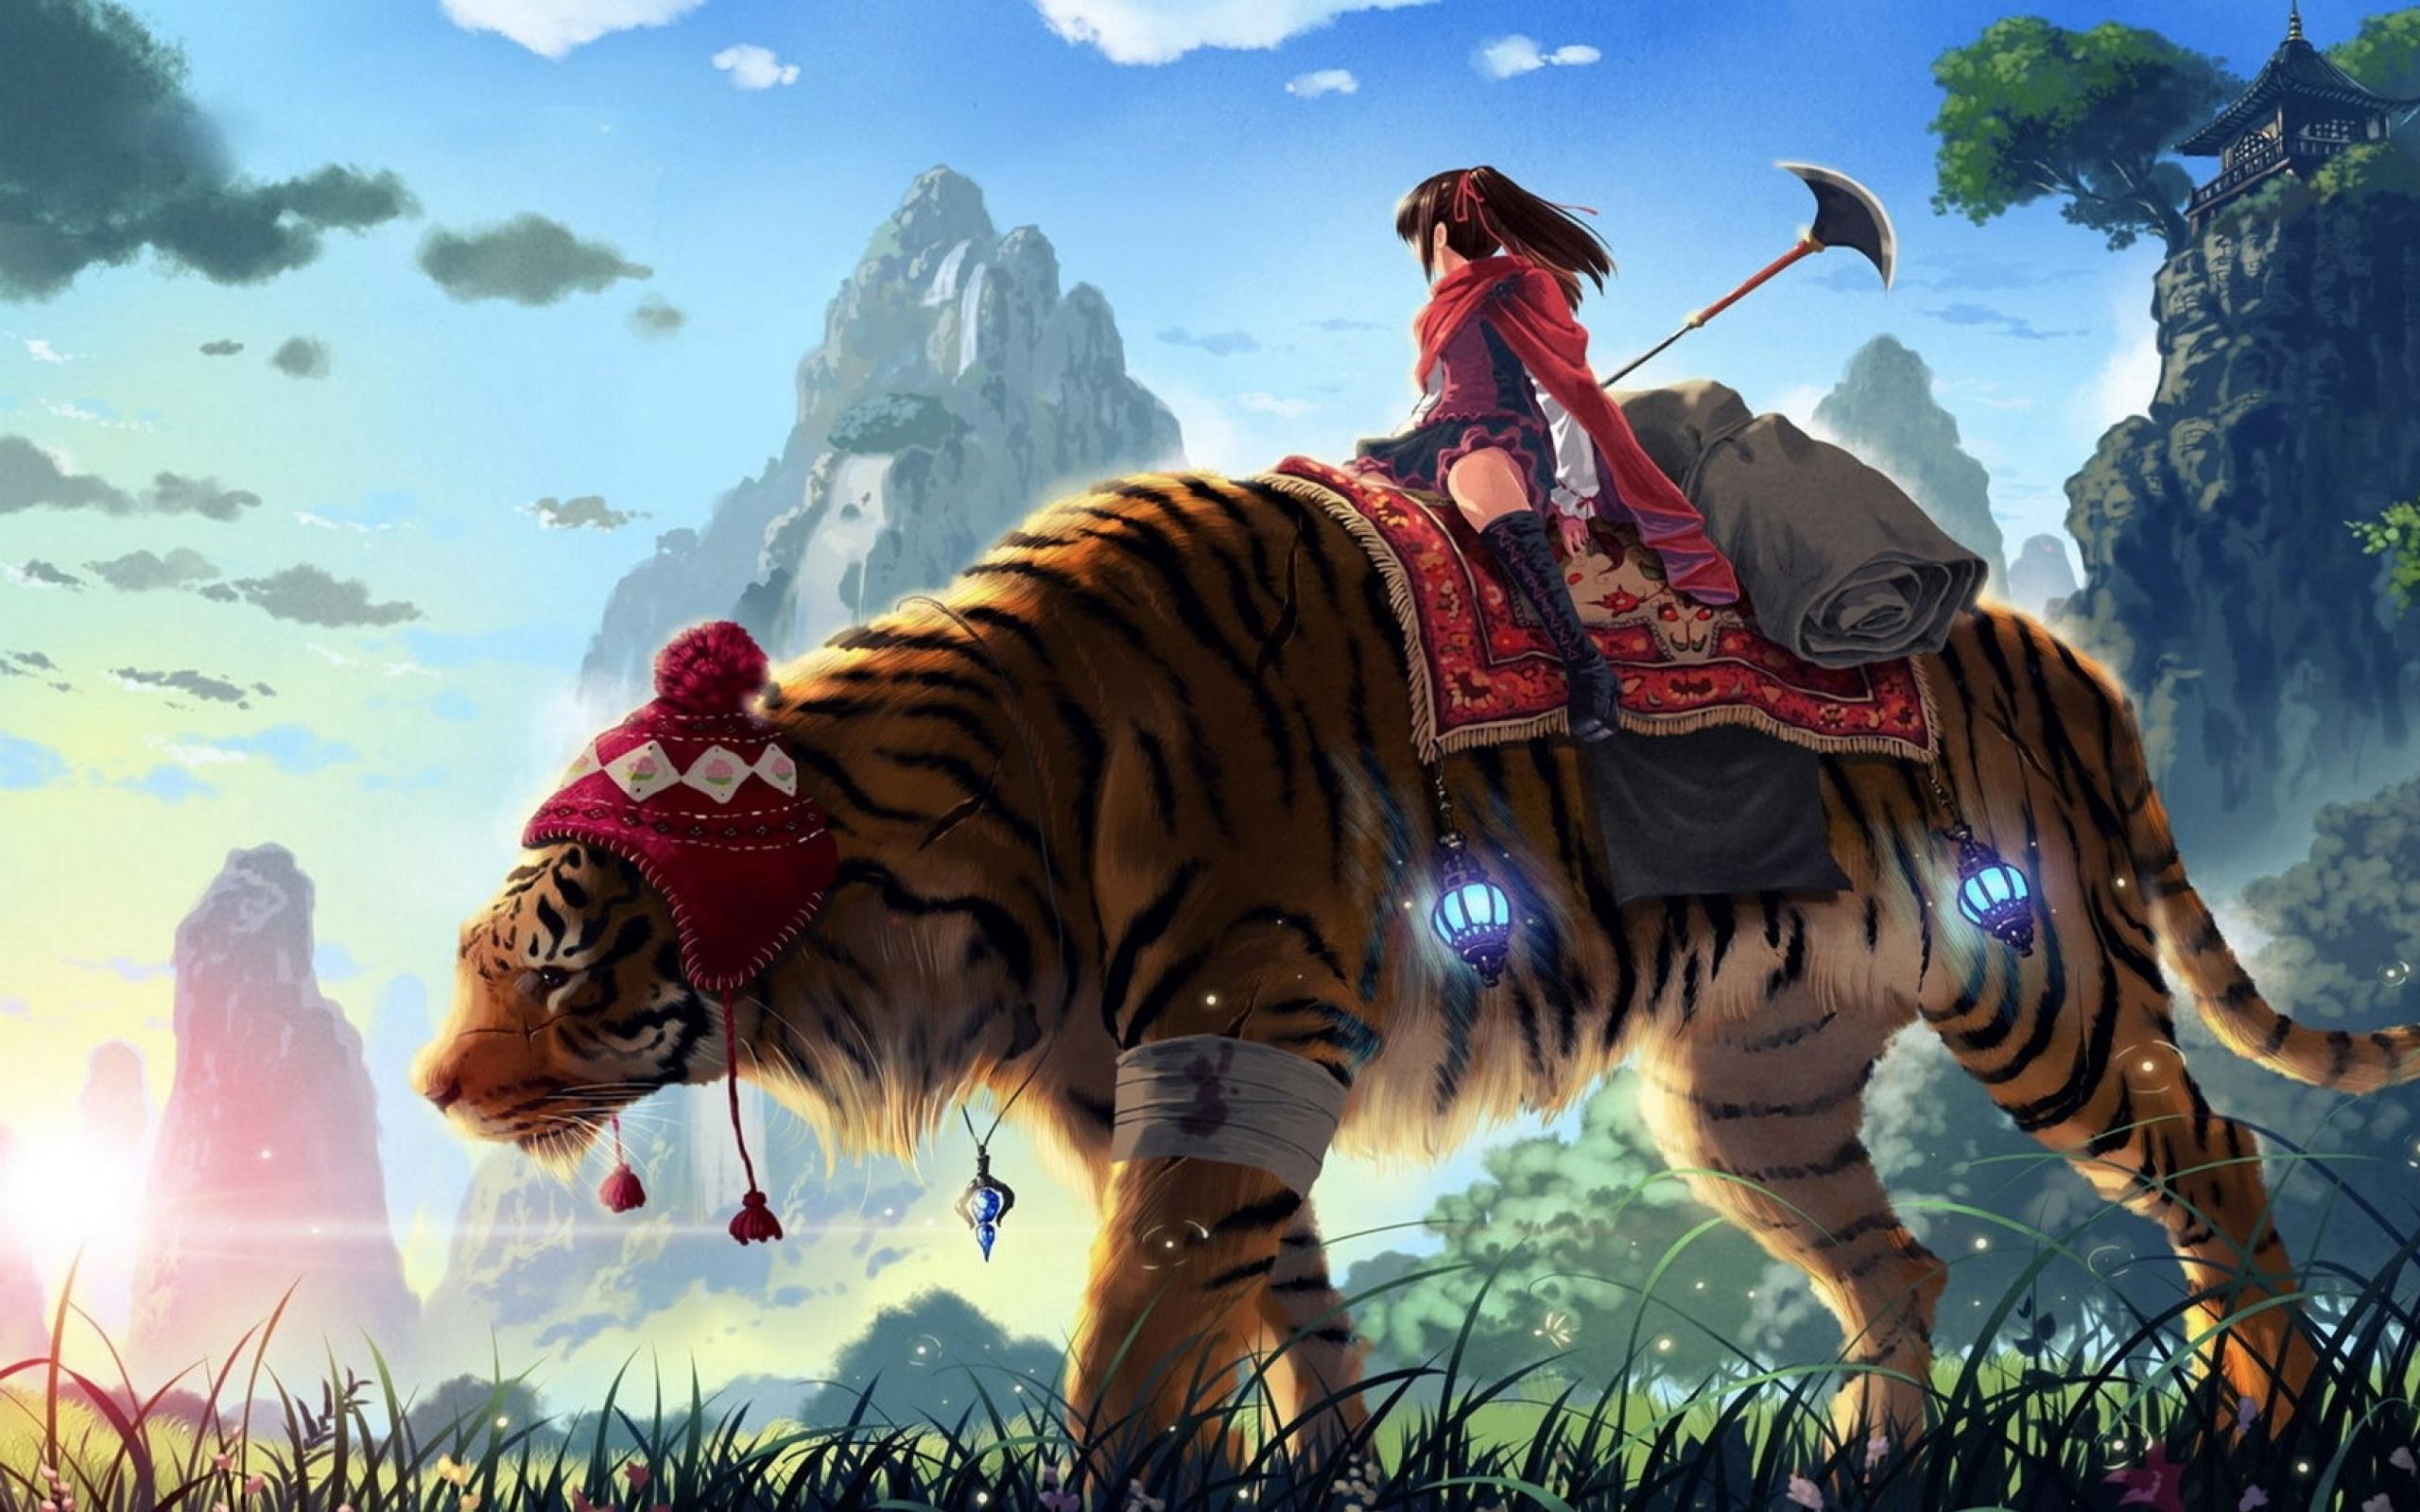 [43+] Epic Anime Wallpaper HD on WallpaperSafari | 2560 x 1600 jpeg 2111kB